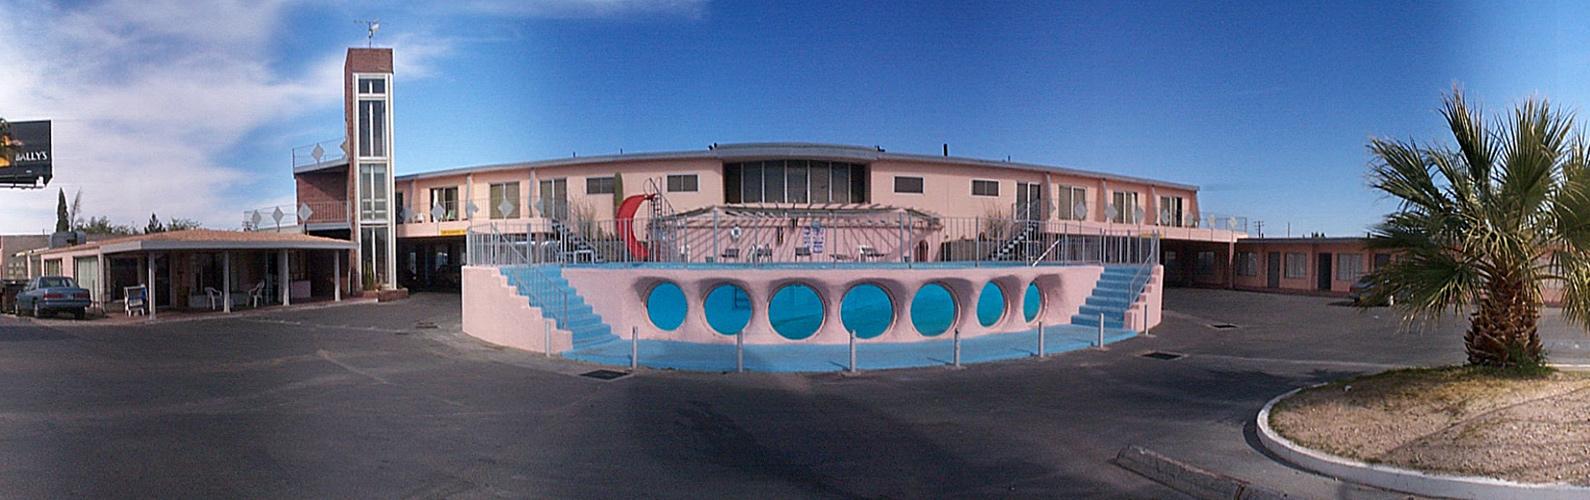 Motel in las vegas strip